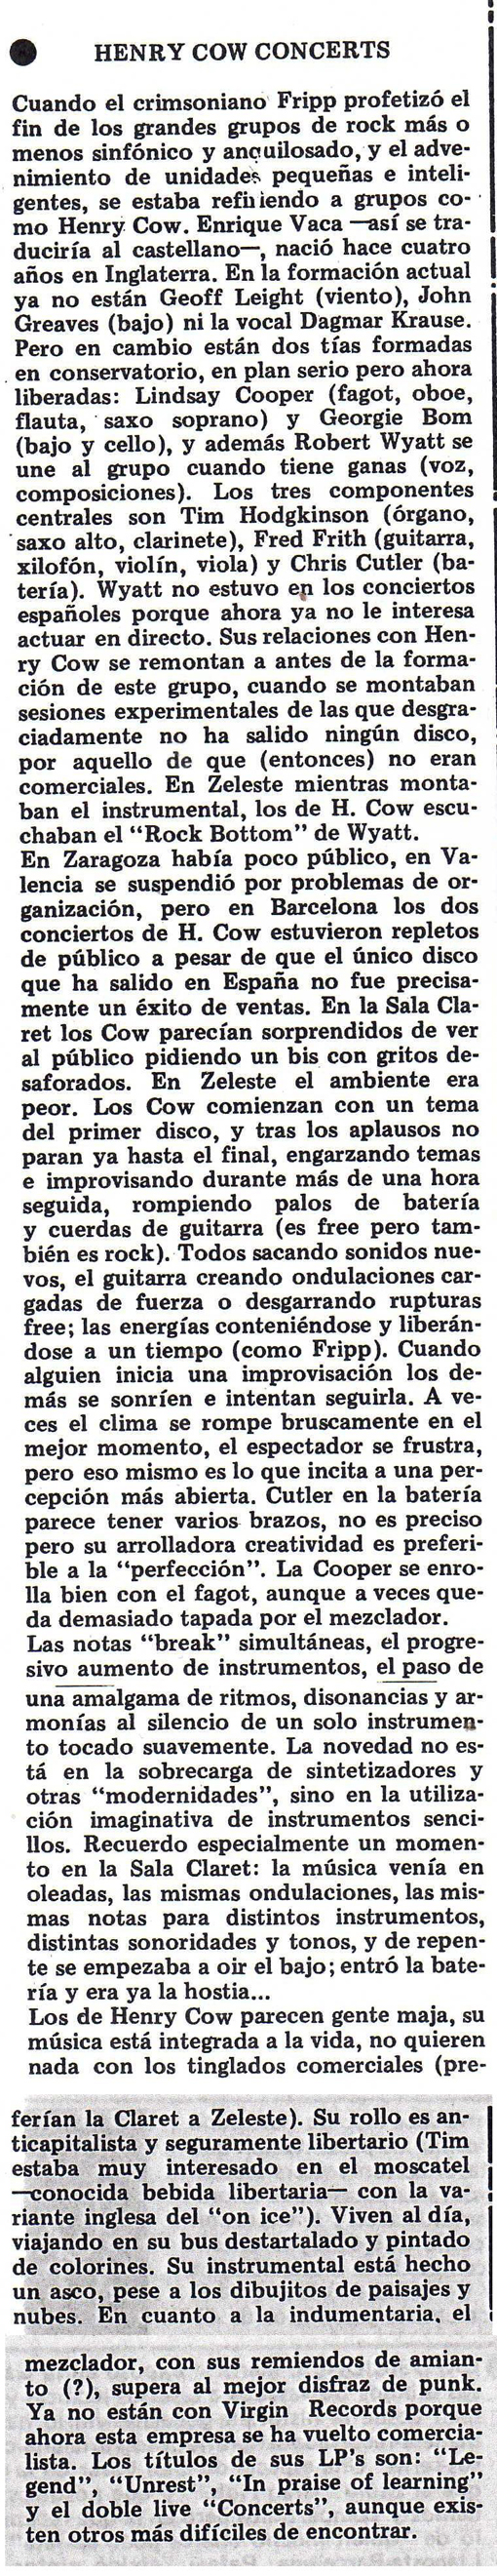 Crítica de Frank X. Puerto (Star)